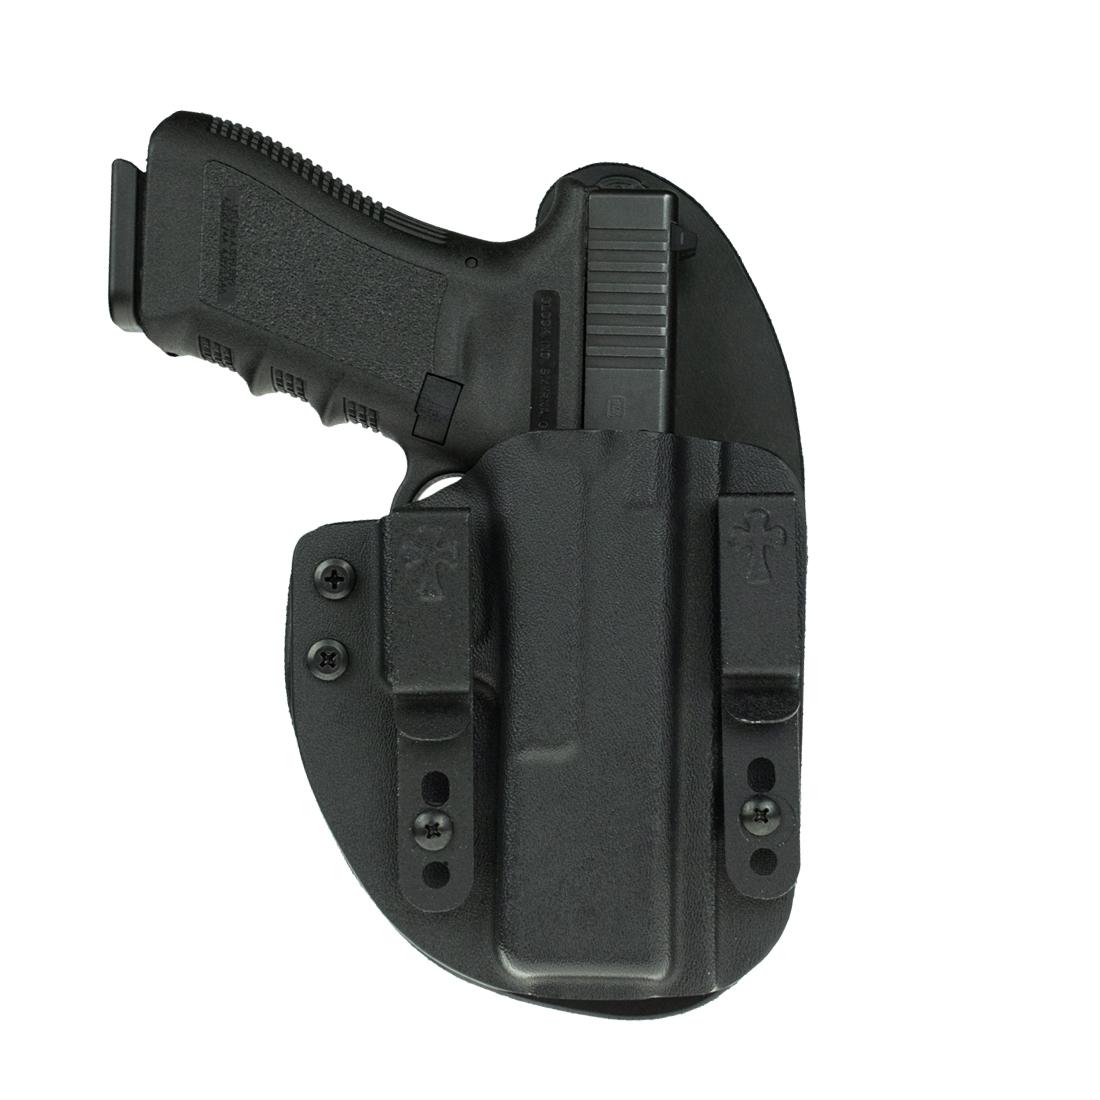 Crossbreed Reckoning Holster, S & W M & P9 Shield